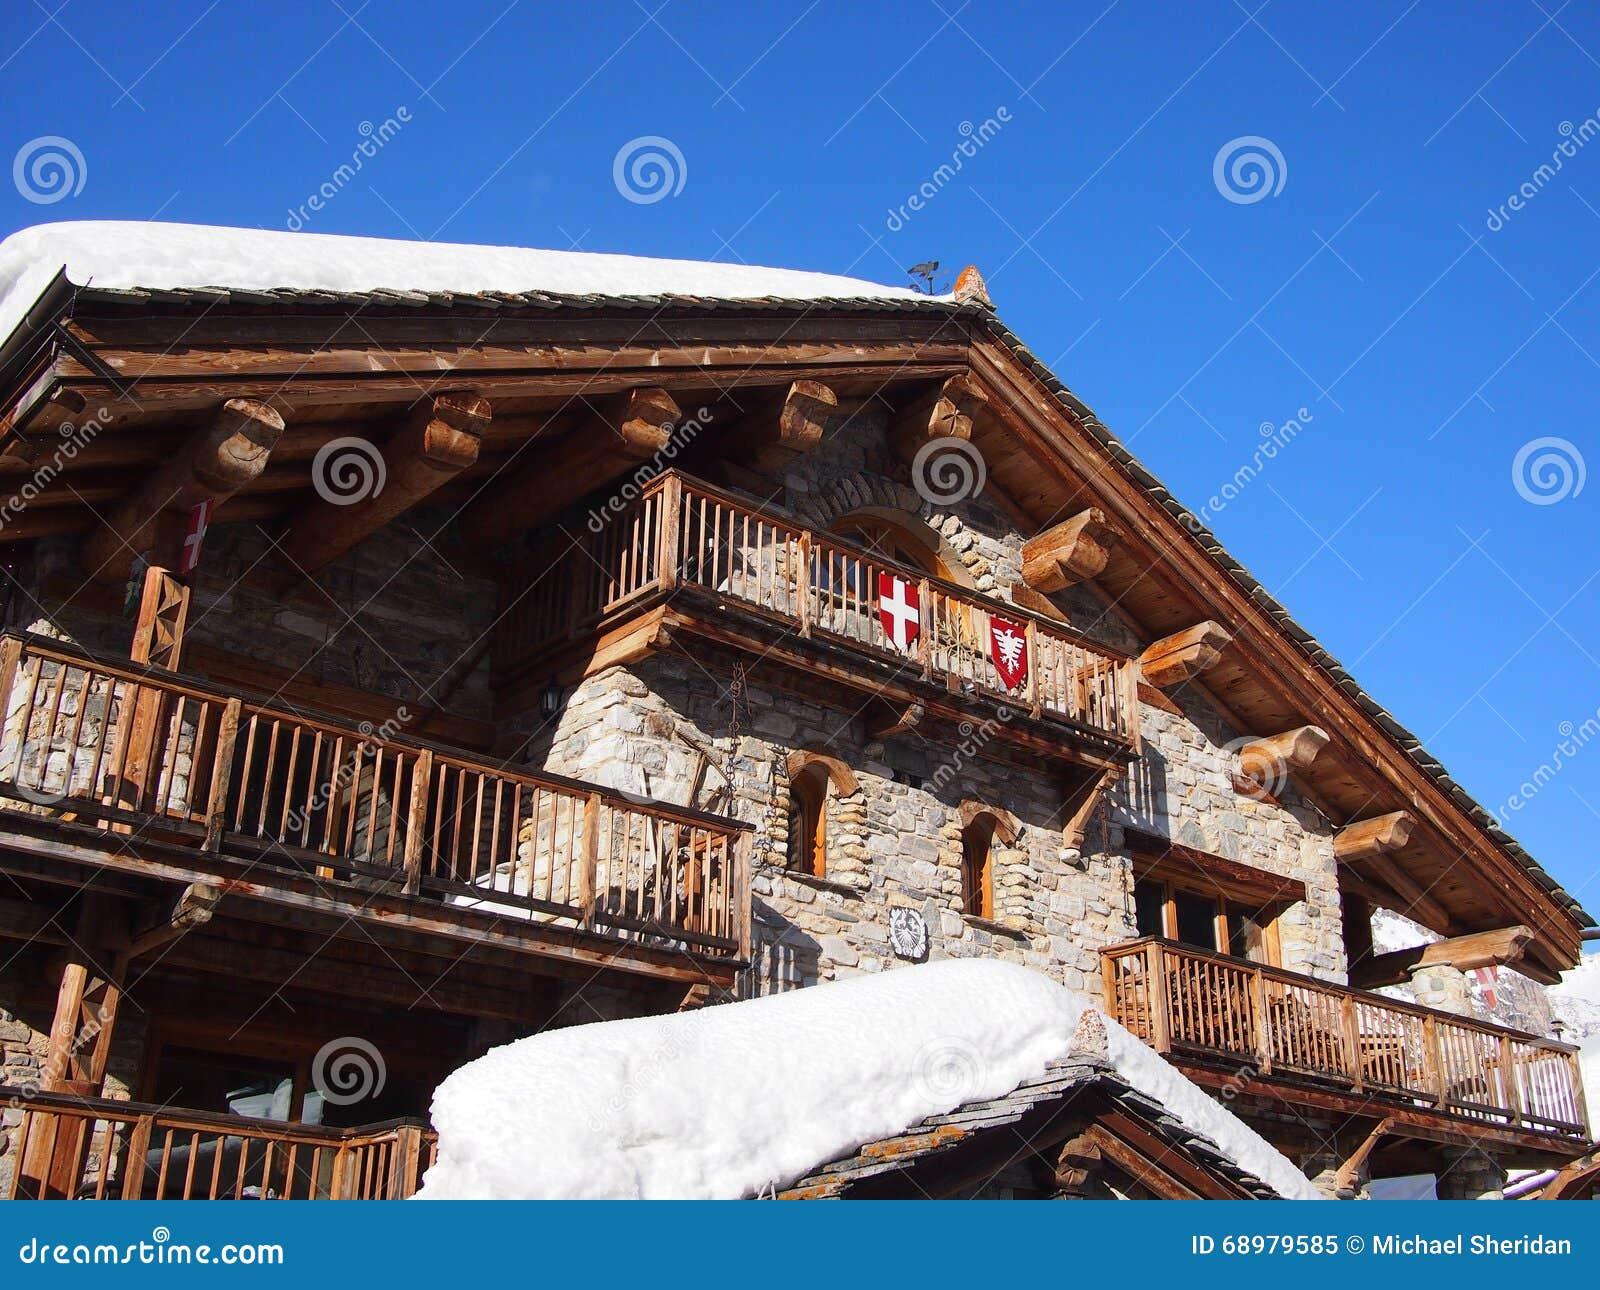 Ski Chalet alpino tradicional